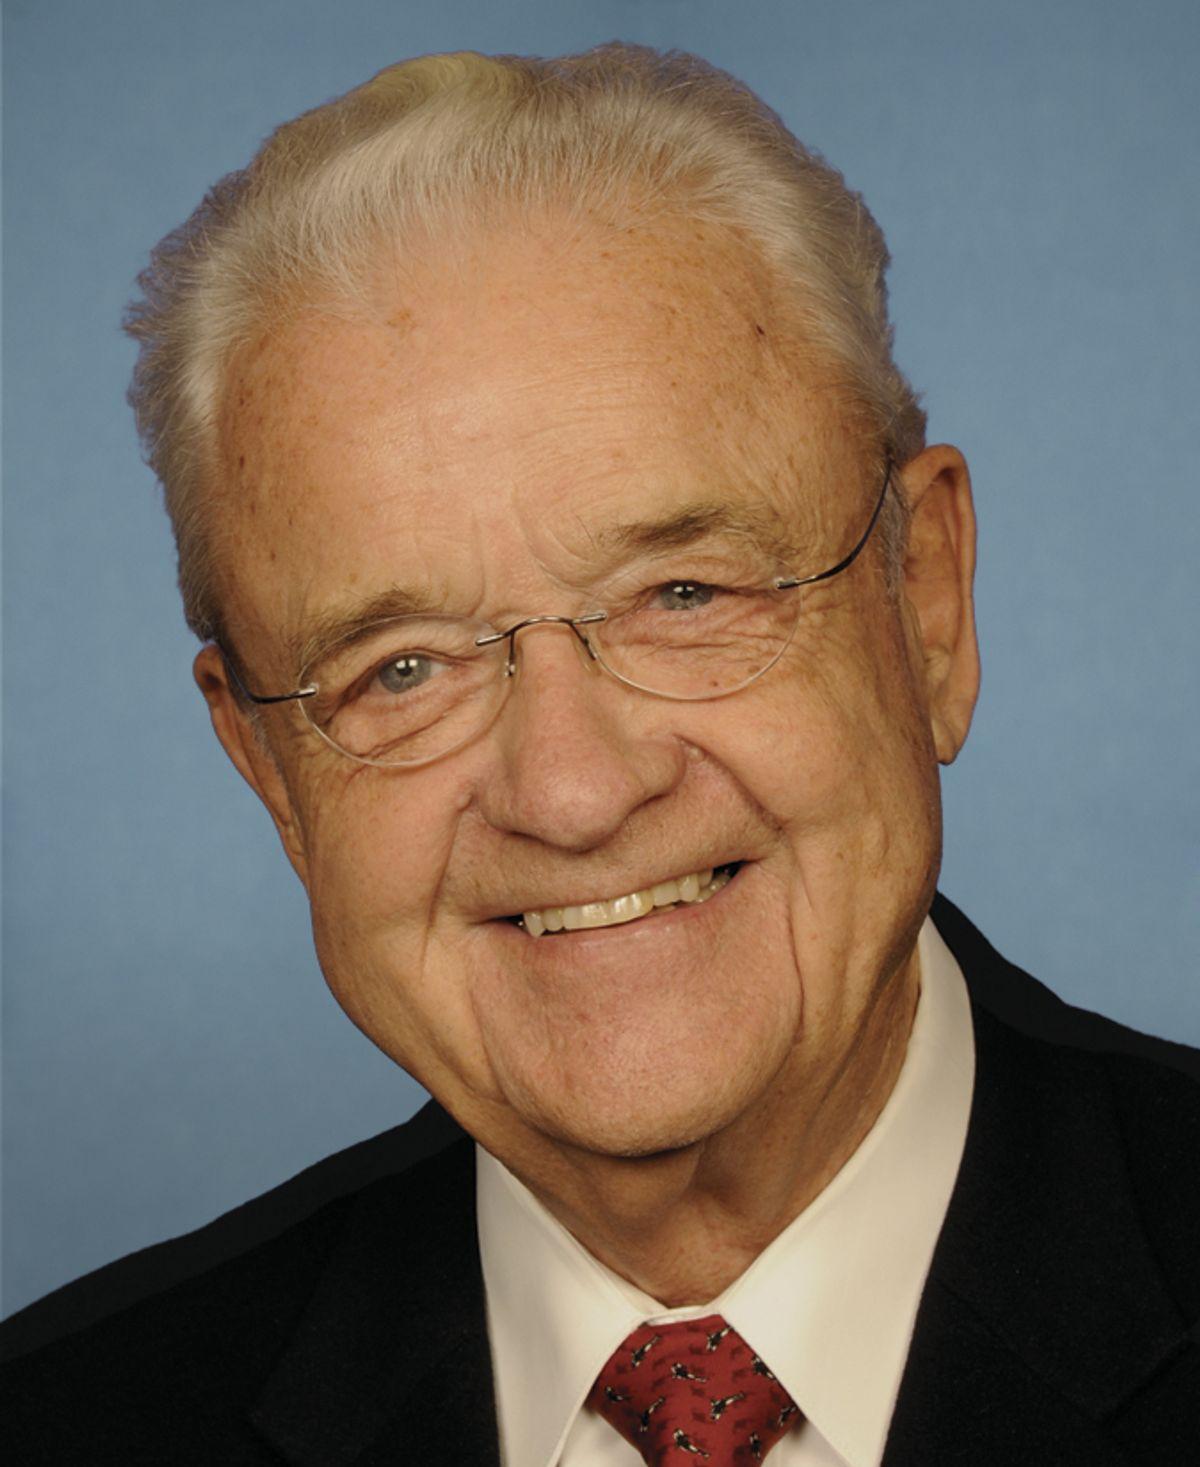 Rep. Leonard Boswell (D-Iowa)